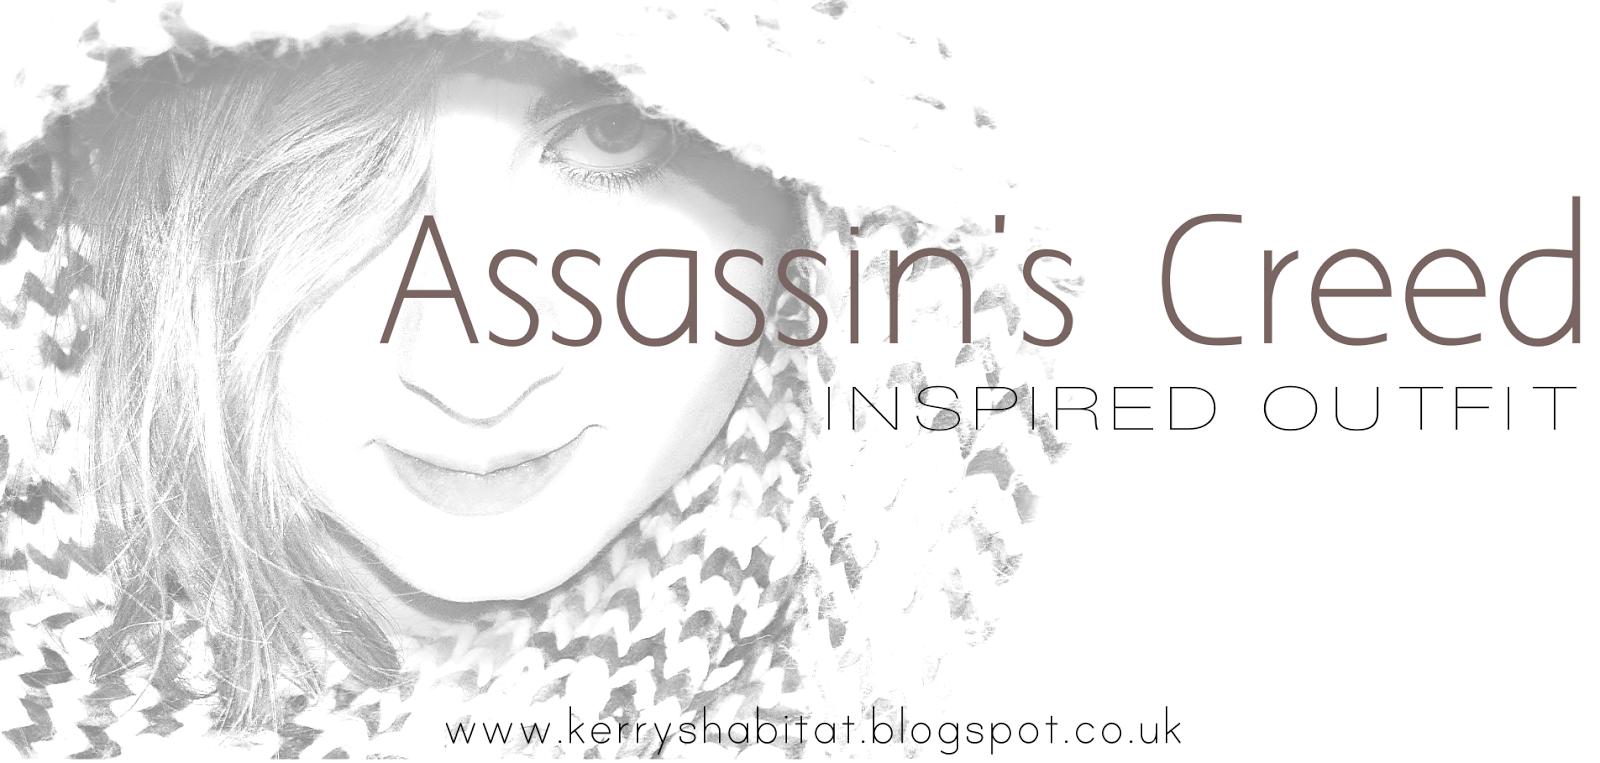 http://kerryshabitat.blogspot.co.uk/2014/03/honoring-creed-in-real-life-assassins.html